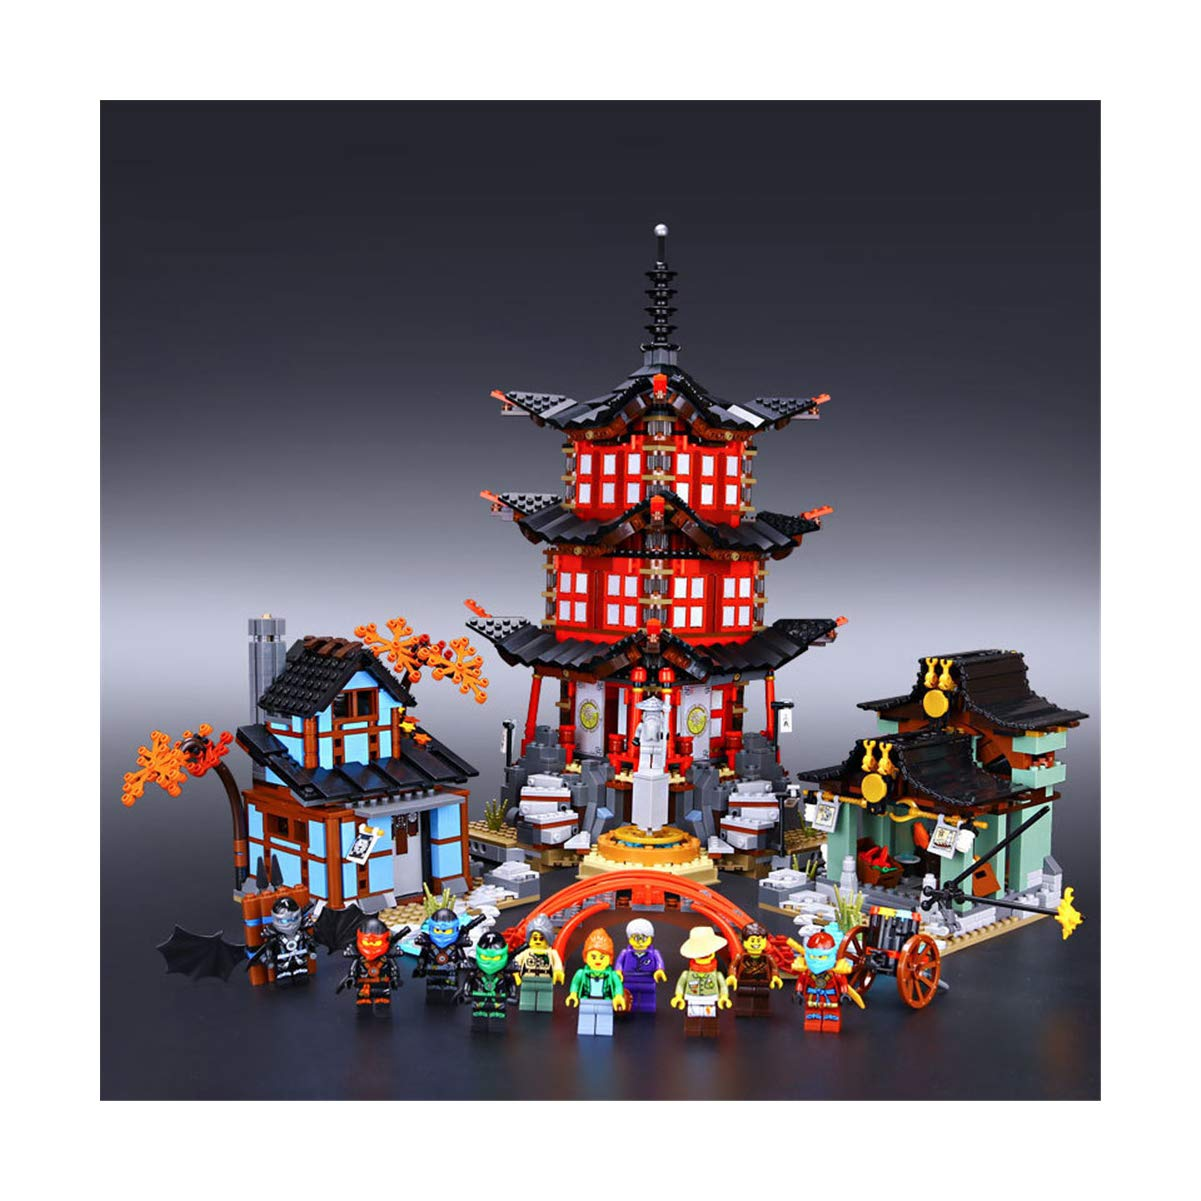 Ninja Temple Village Reunido con Bloques de Juguete